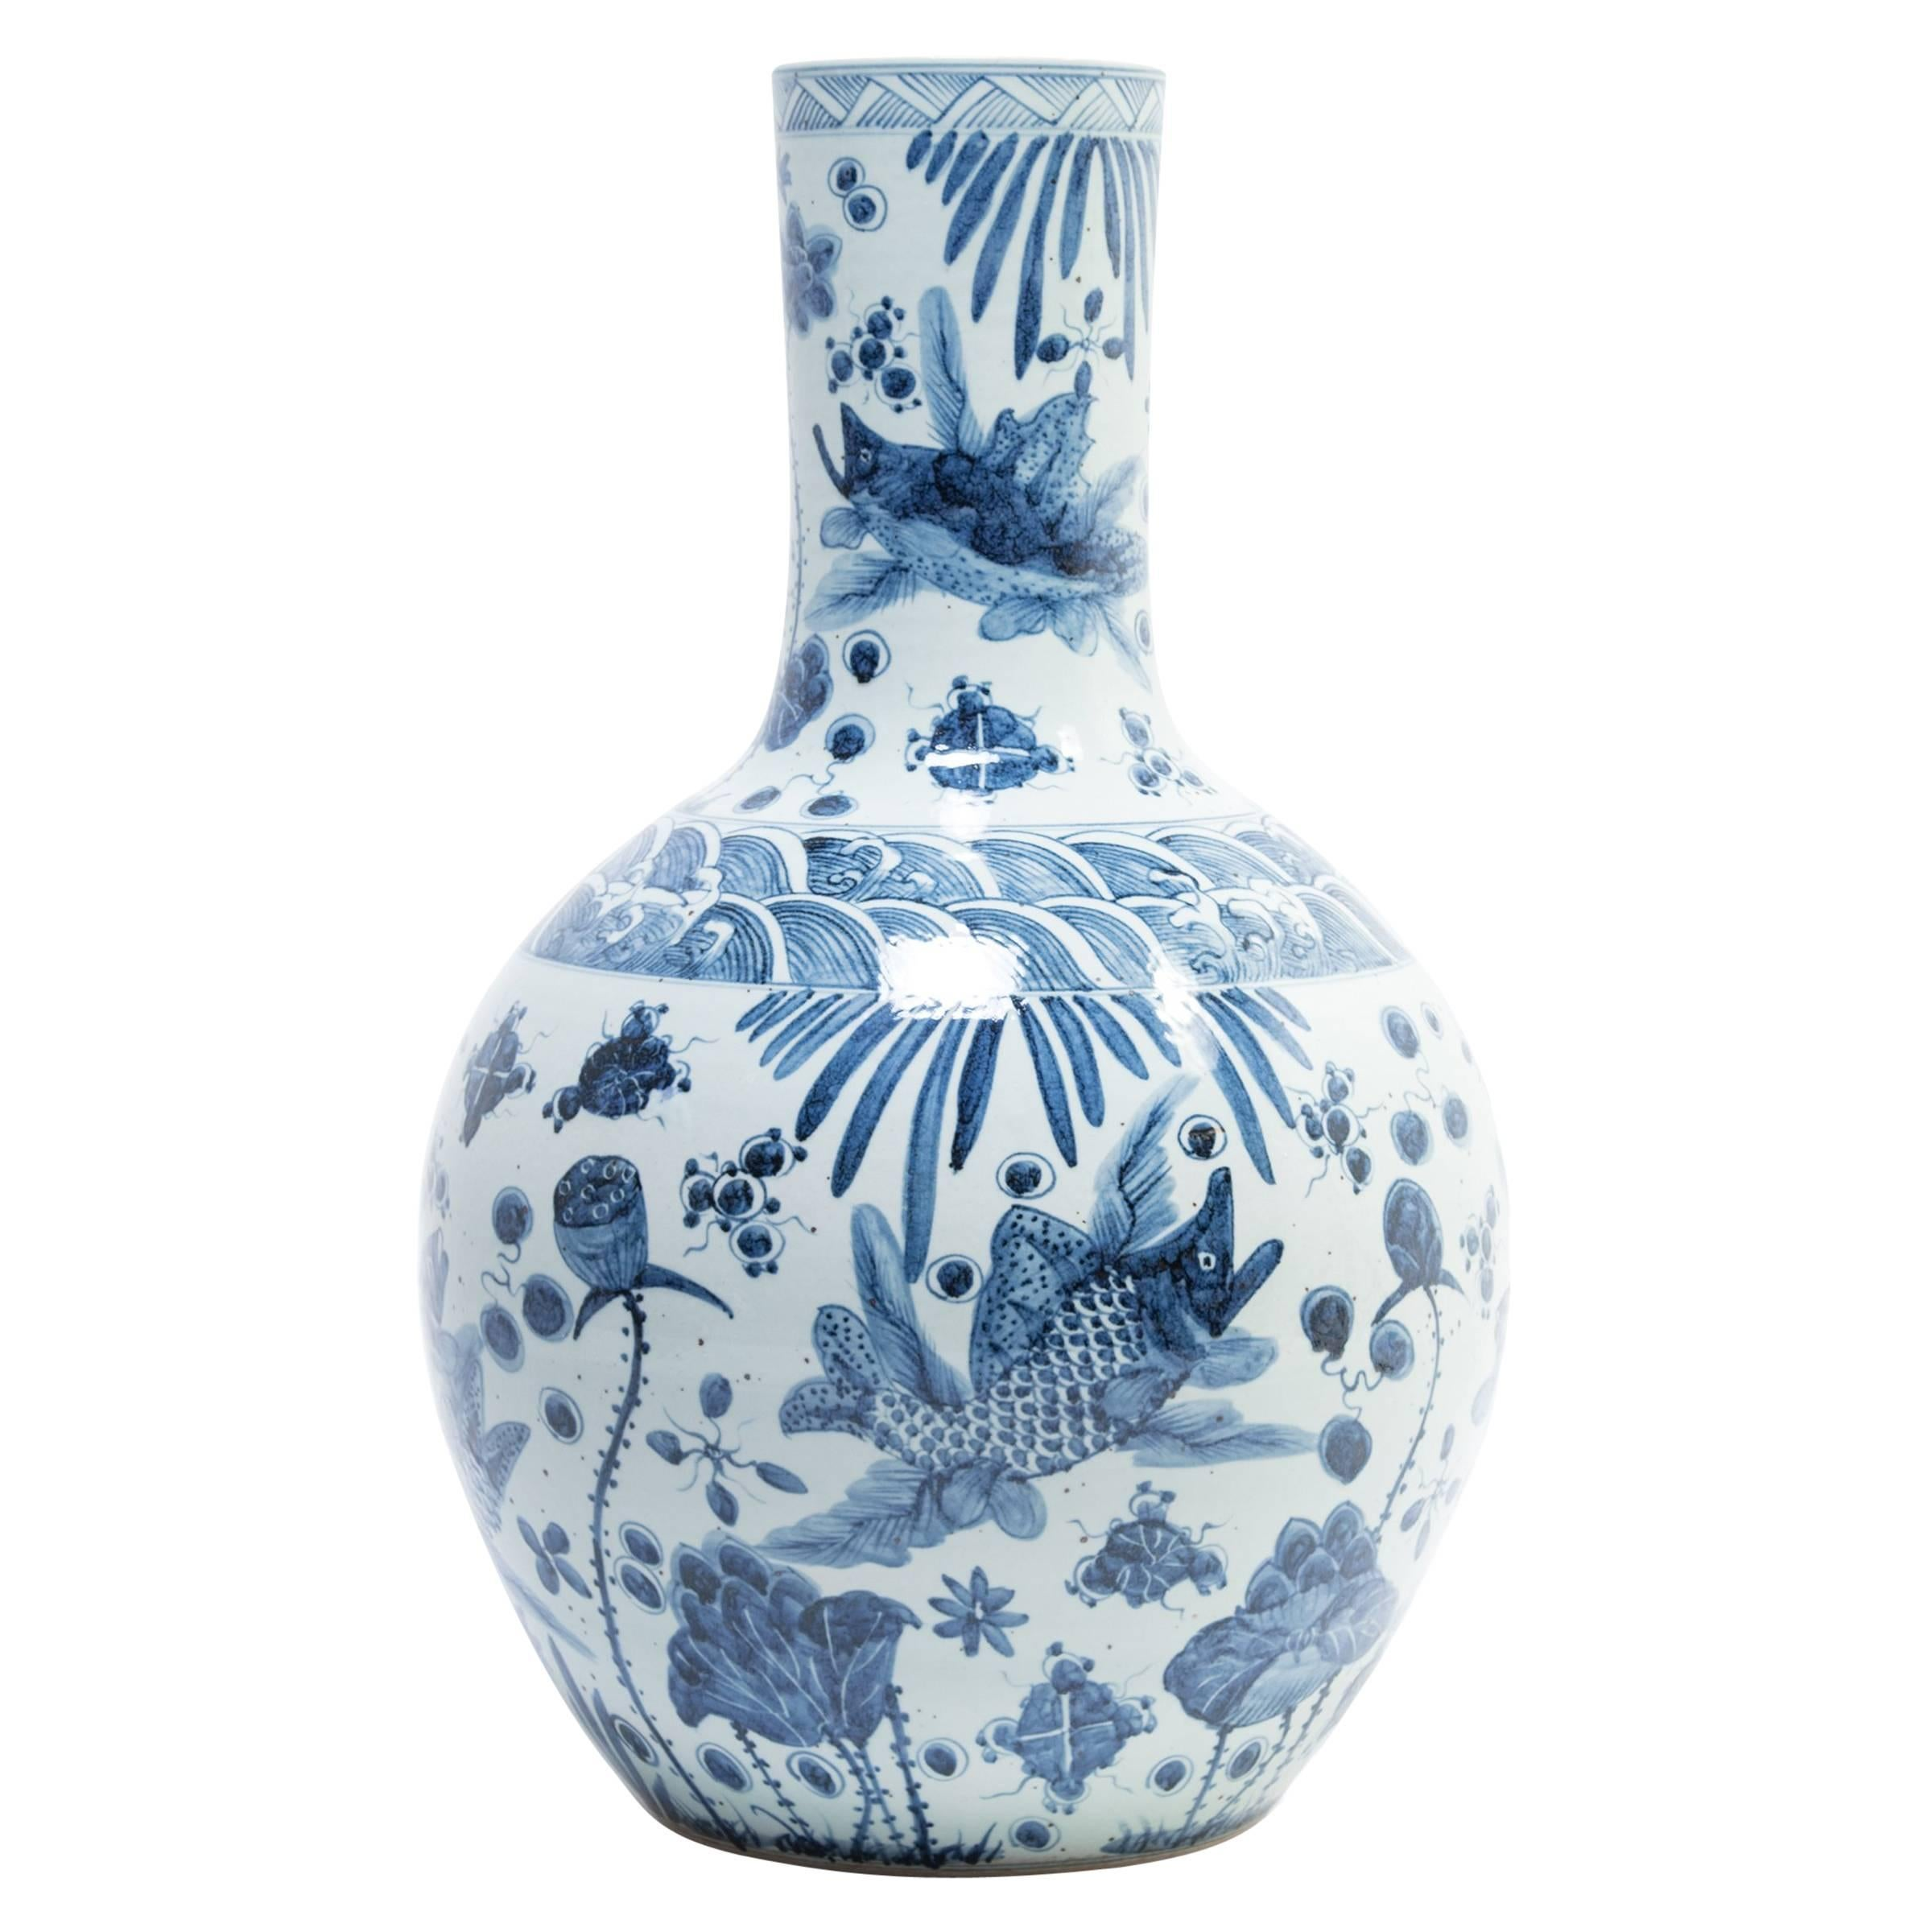 Chinese Blue and White Koi Bottleneck Vase